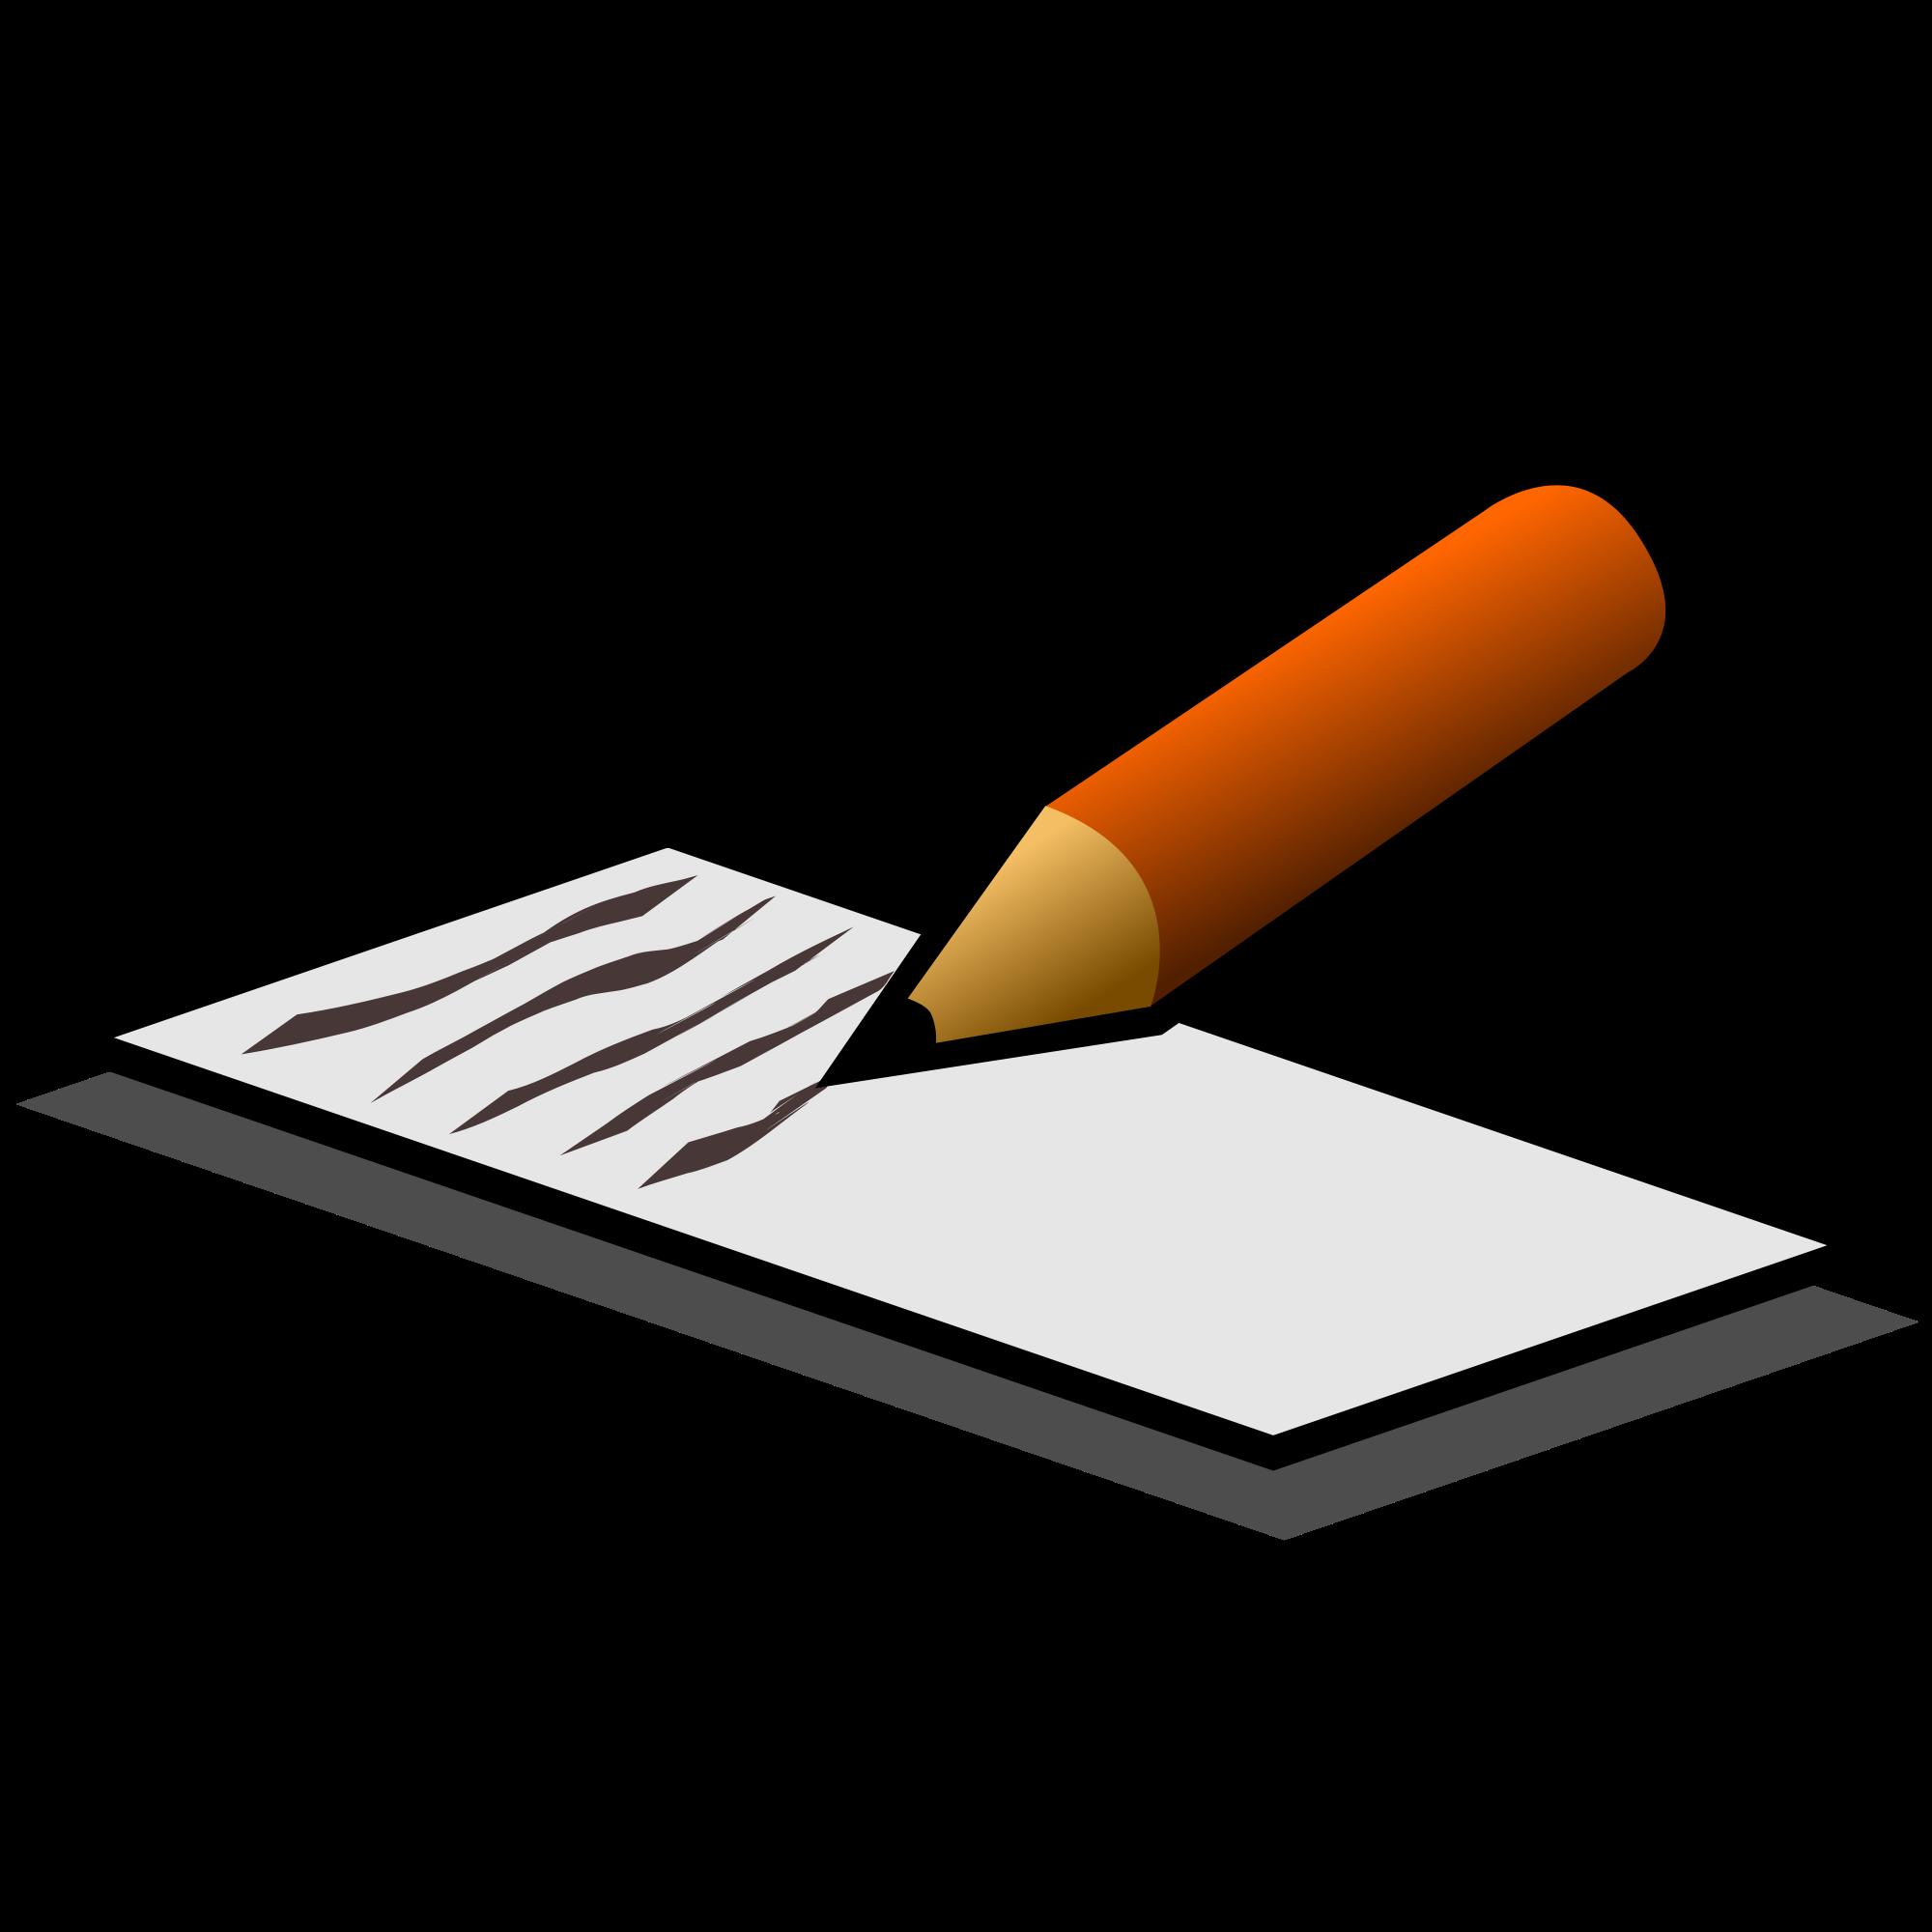 Clipart paper essay, Clipart paper essay Transparent FREE.